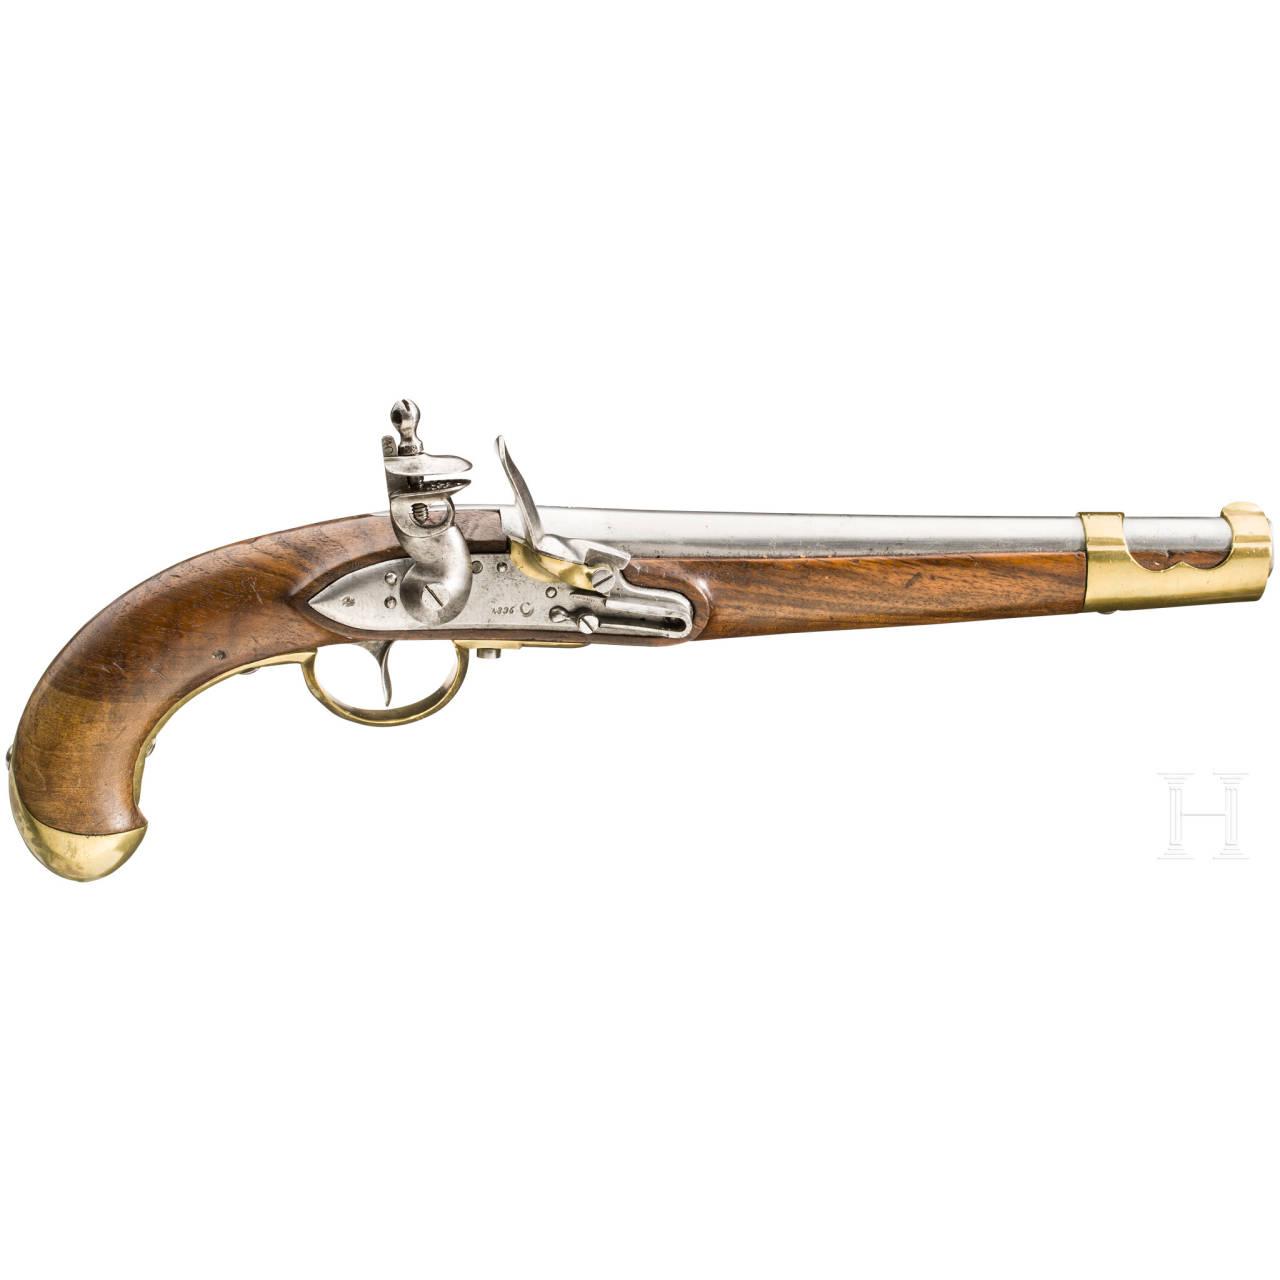 Kavalleriepistole M 1798